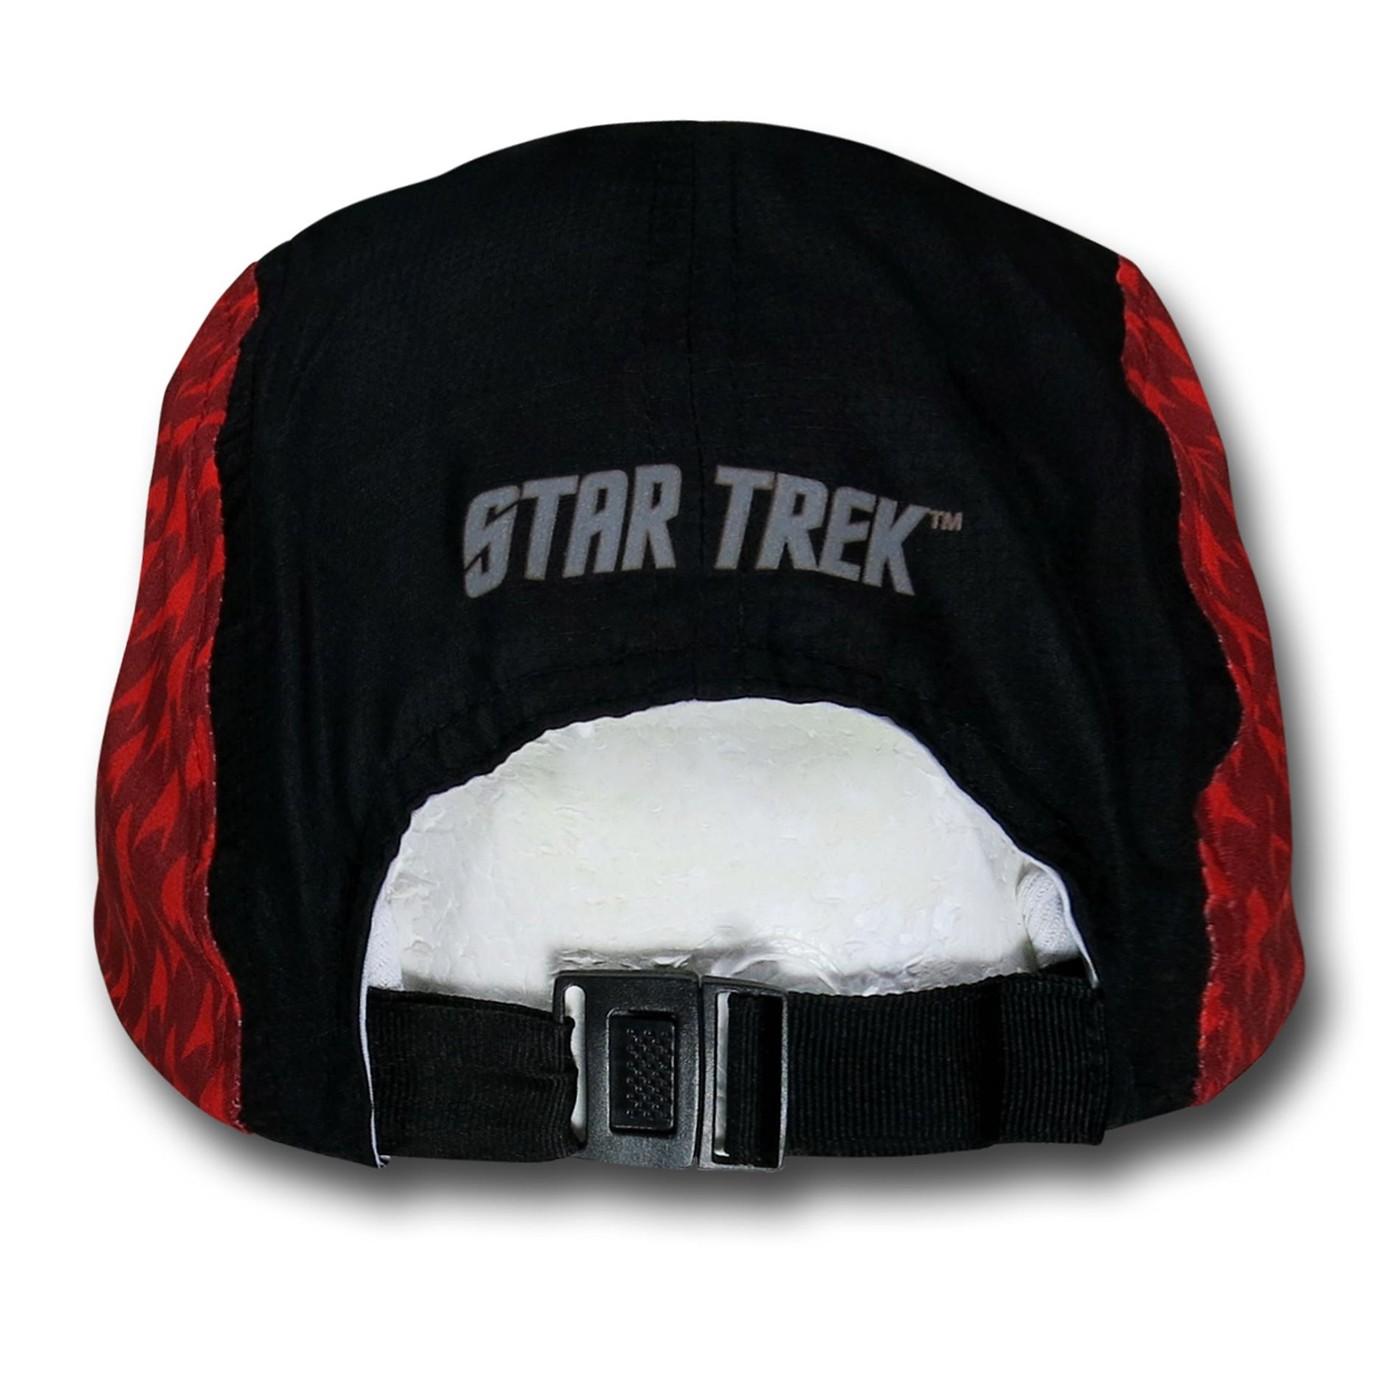 Star Trek Engineering Security Running Cap